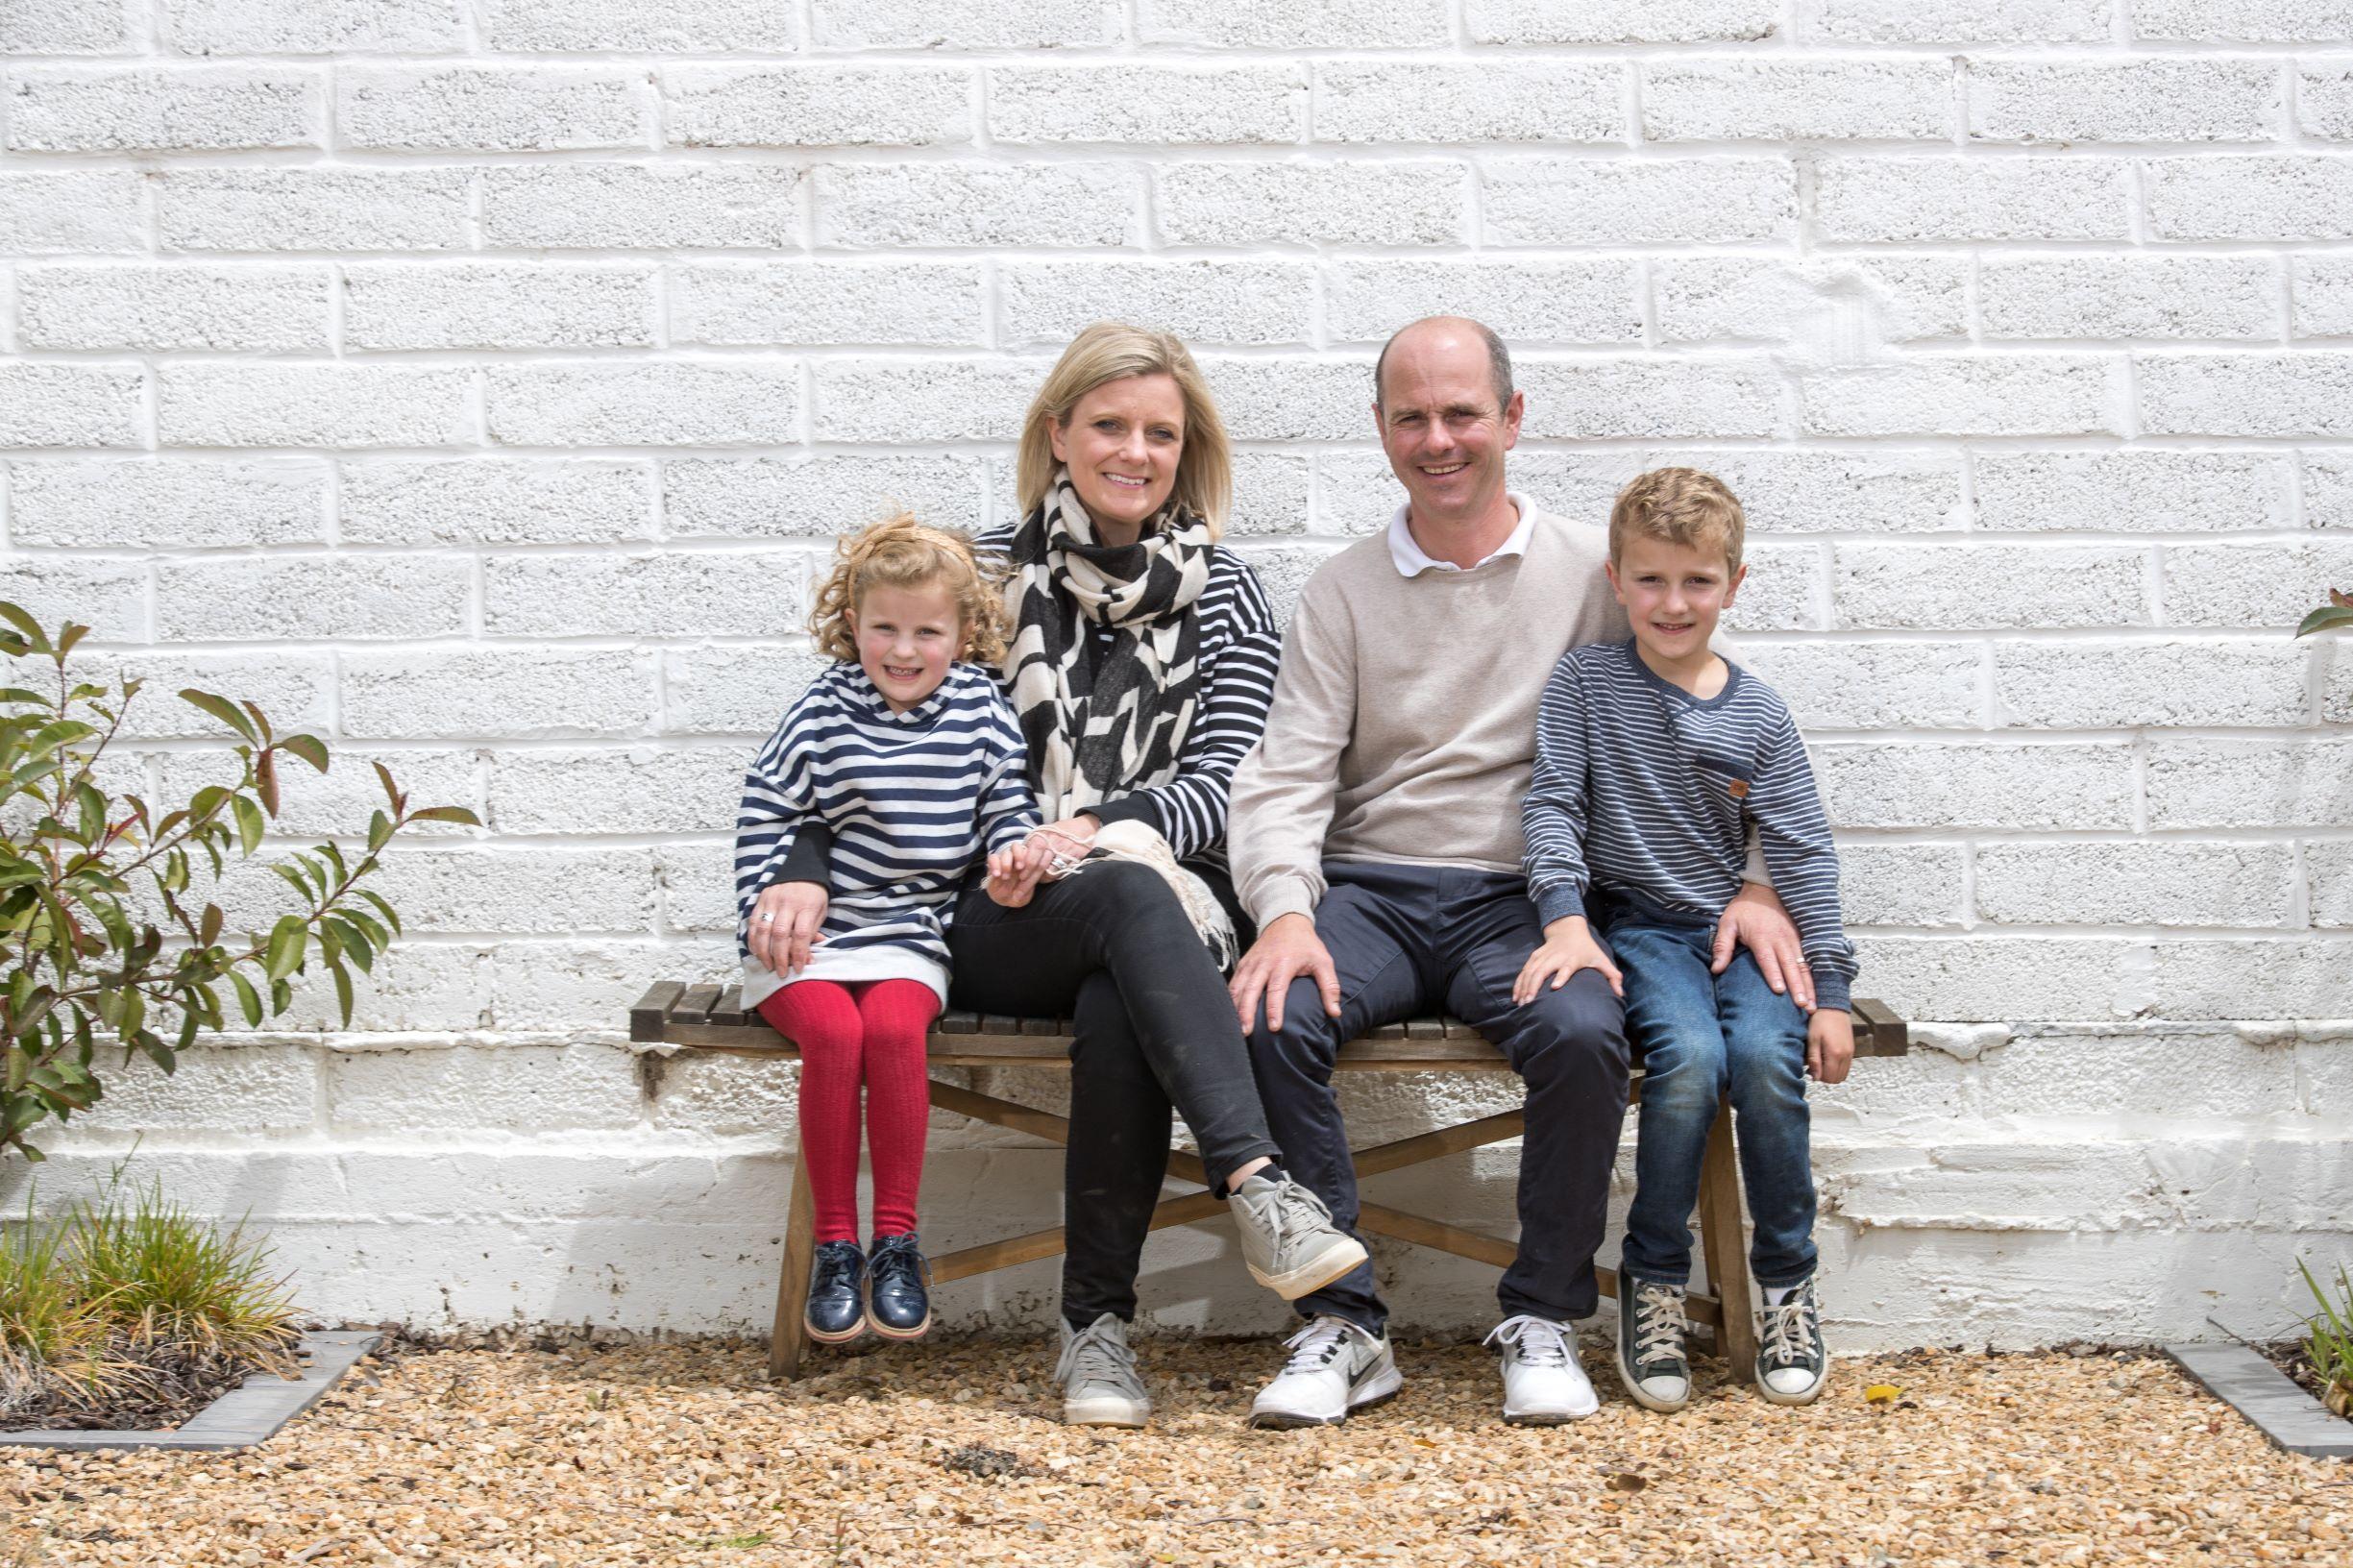 Newenham Residents Story